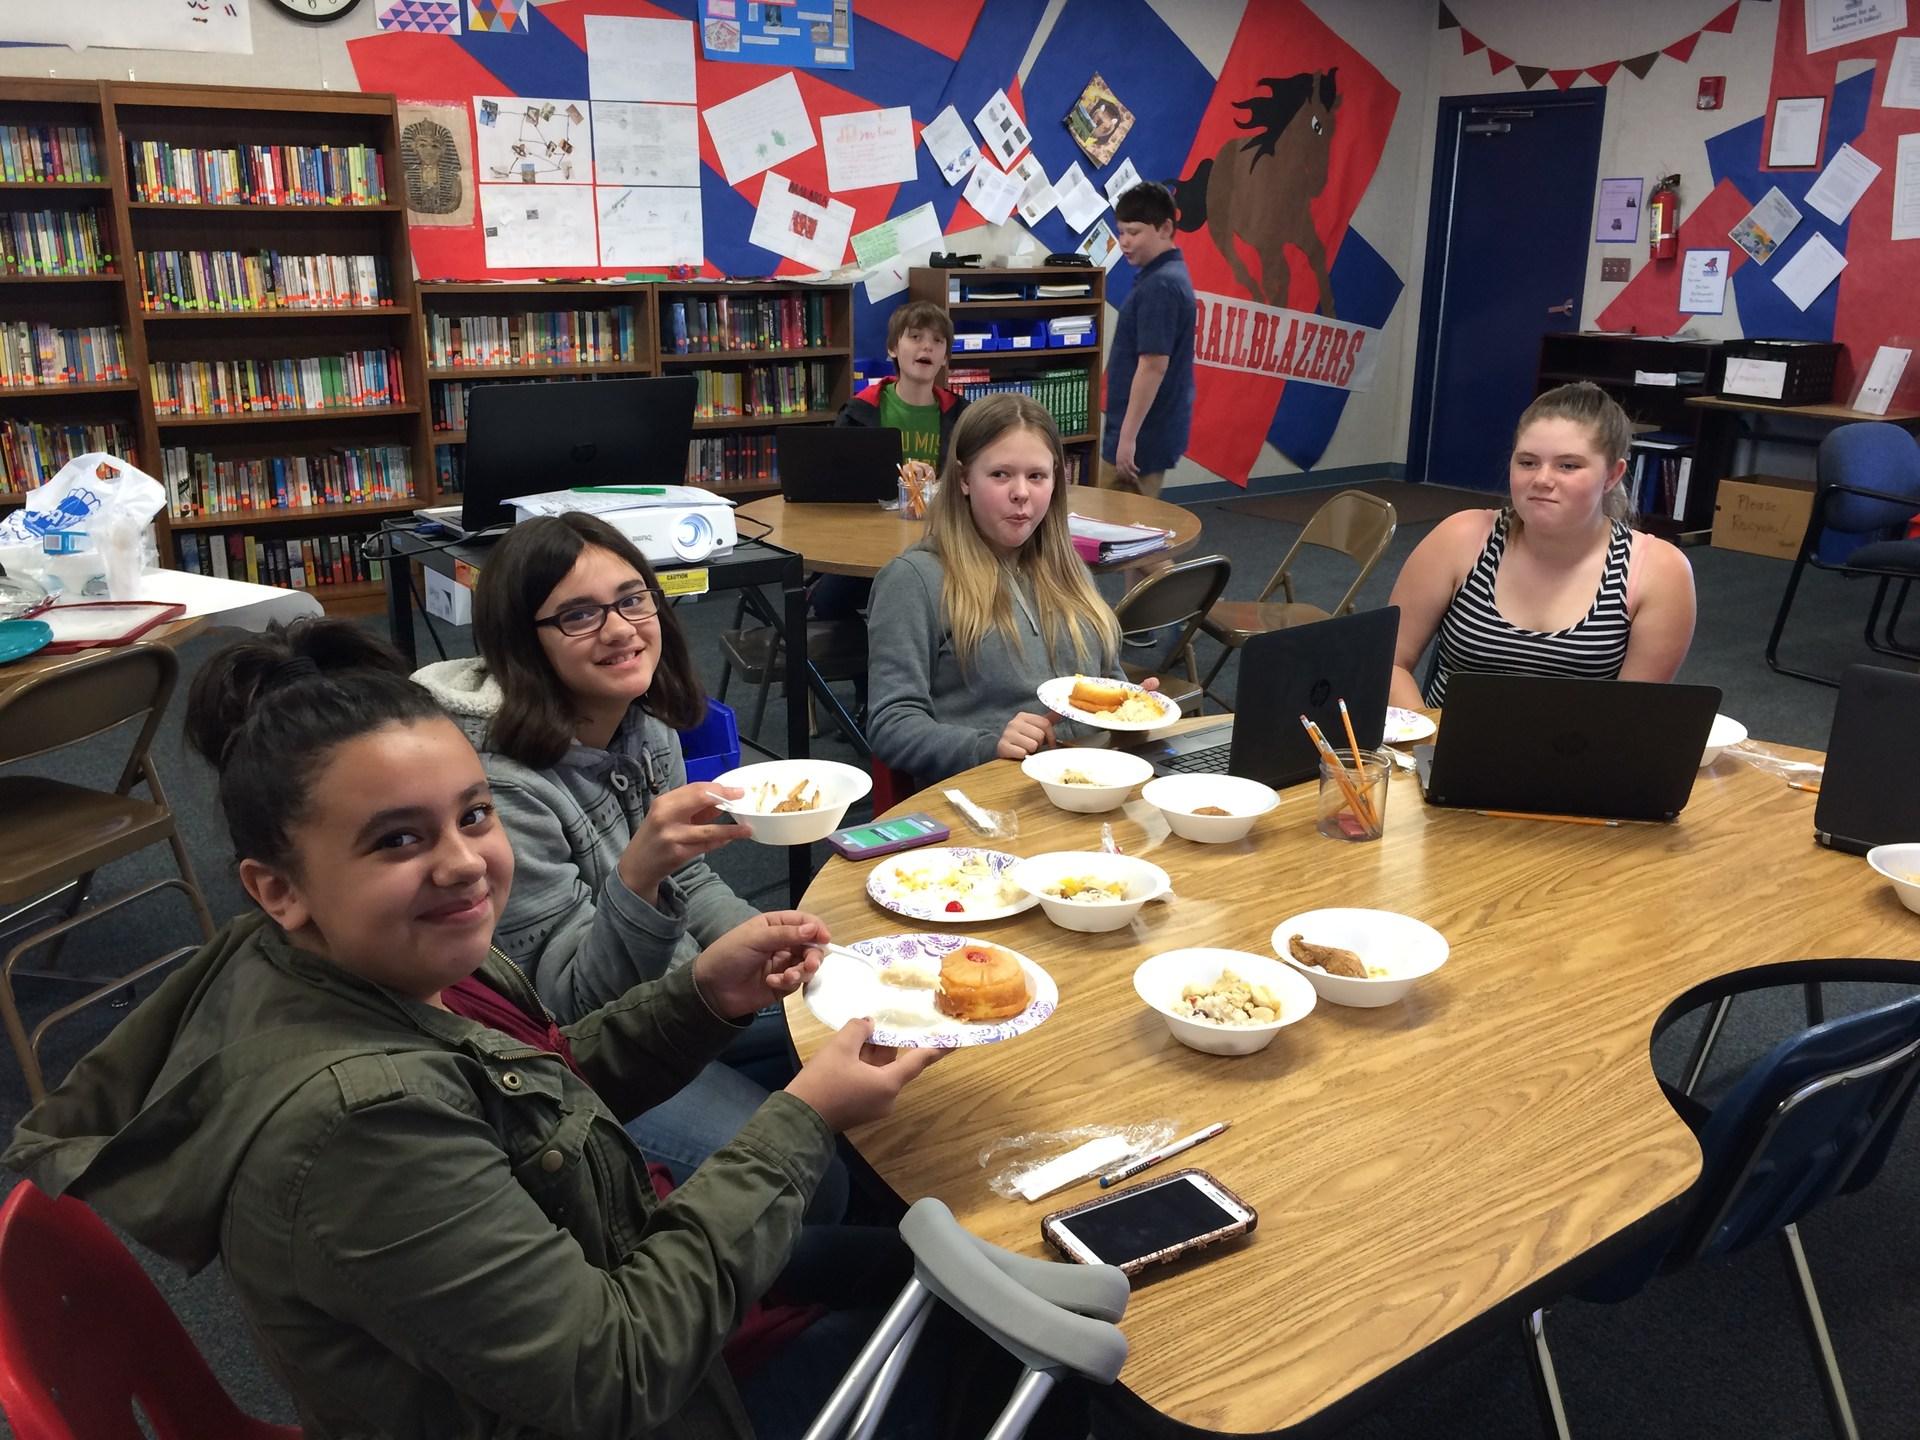 Students eating Caribbean food.